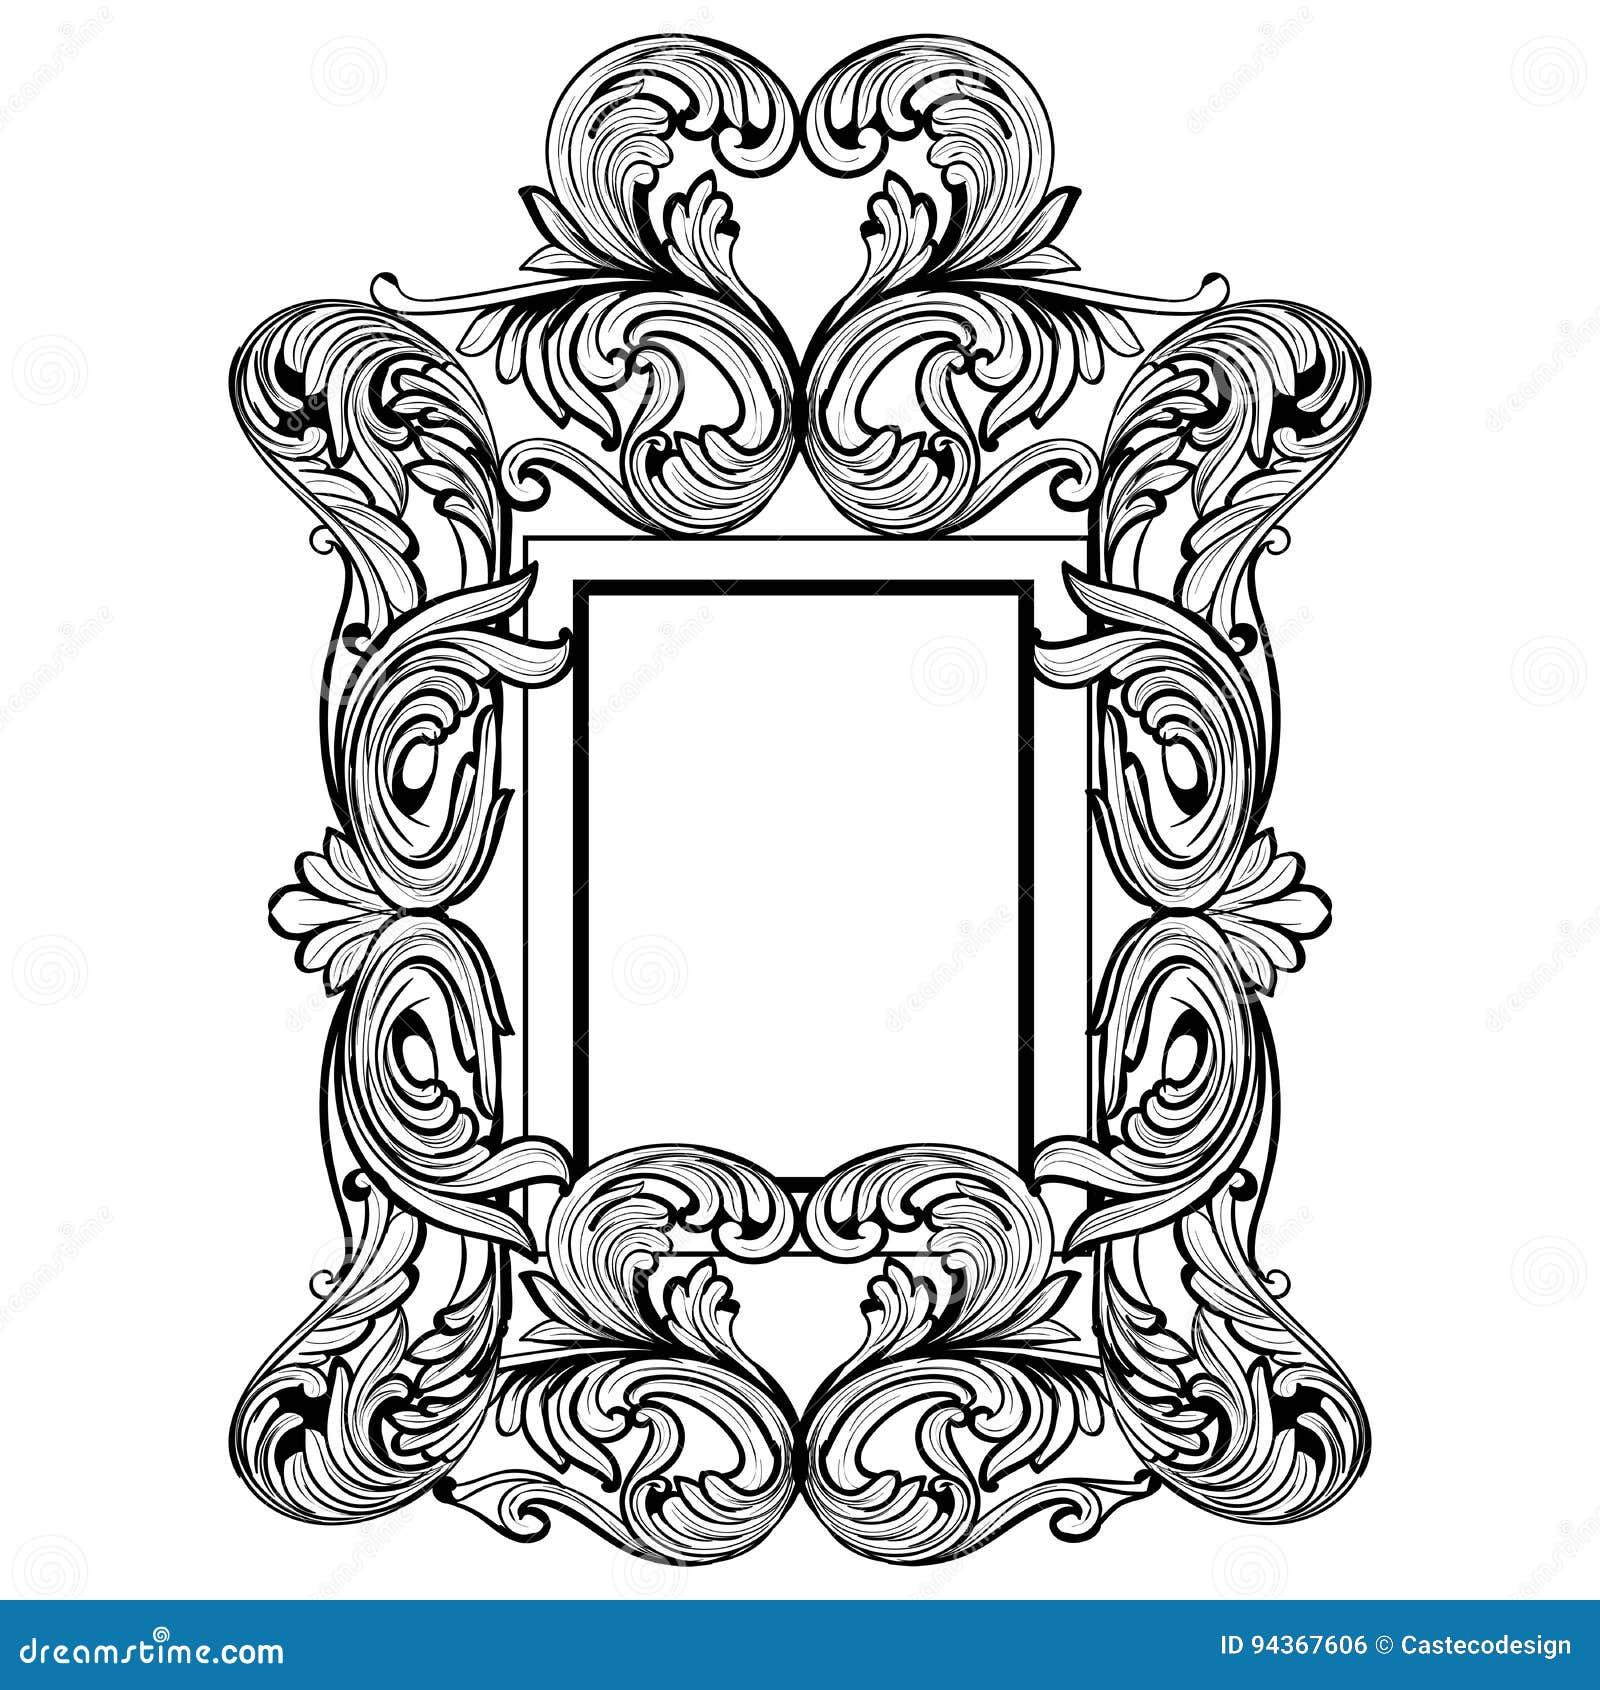 Wilko baroque mirror silver 87x62cm -  Rich Baroque Mirror Frame Vector French Luxury Rich Intricate